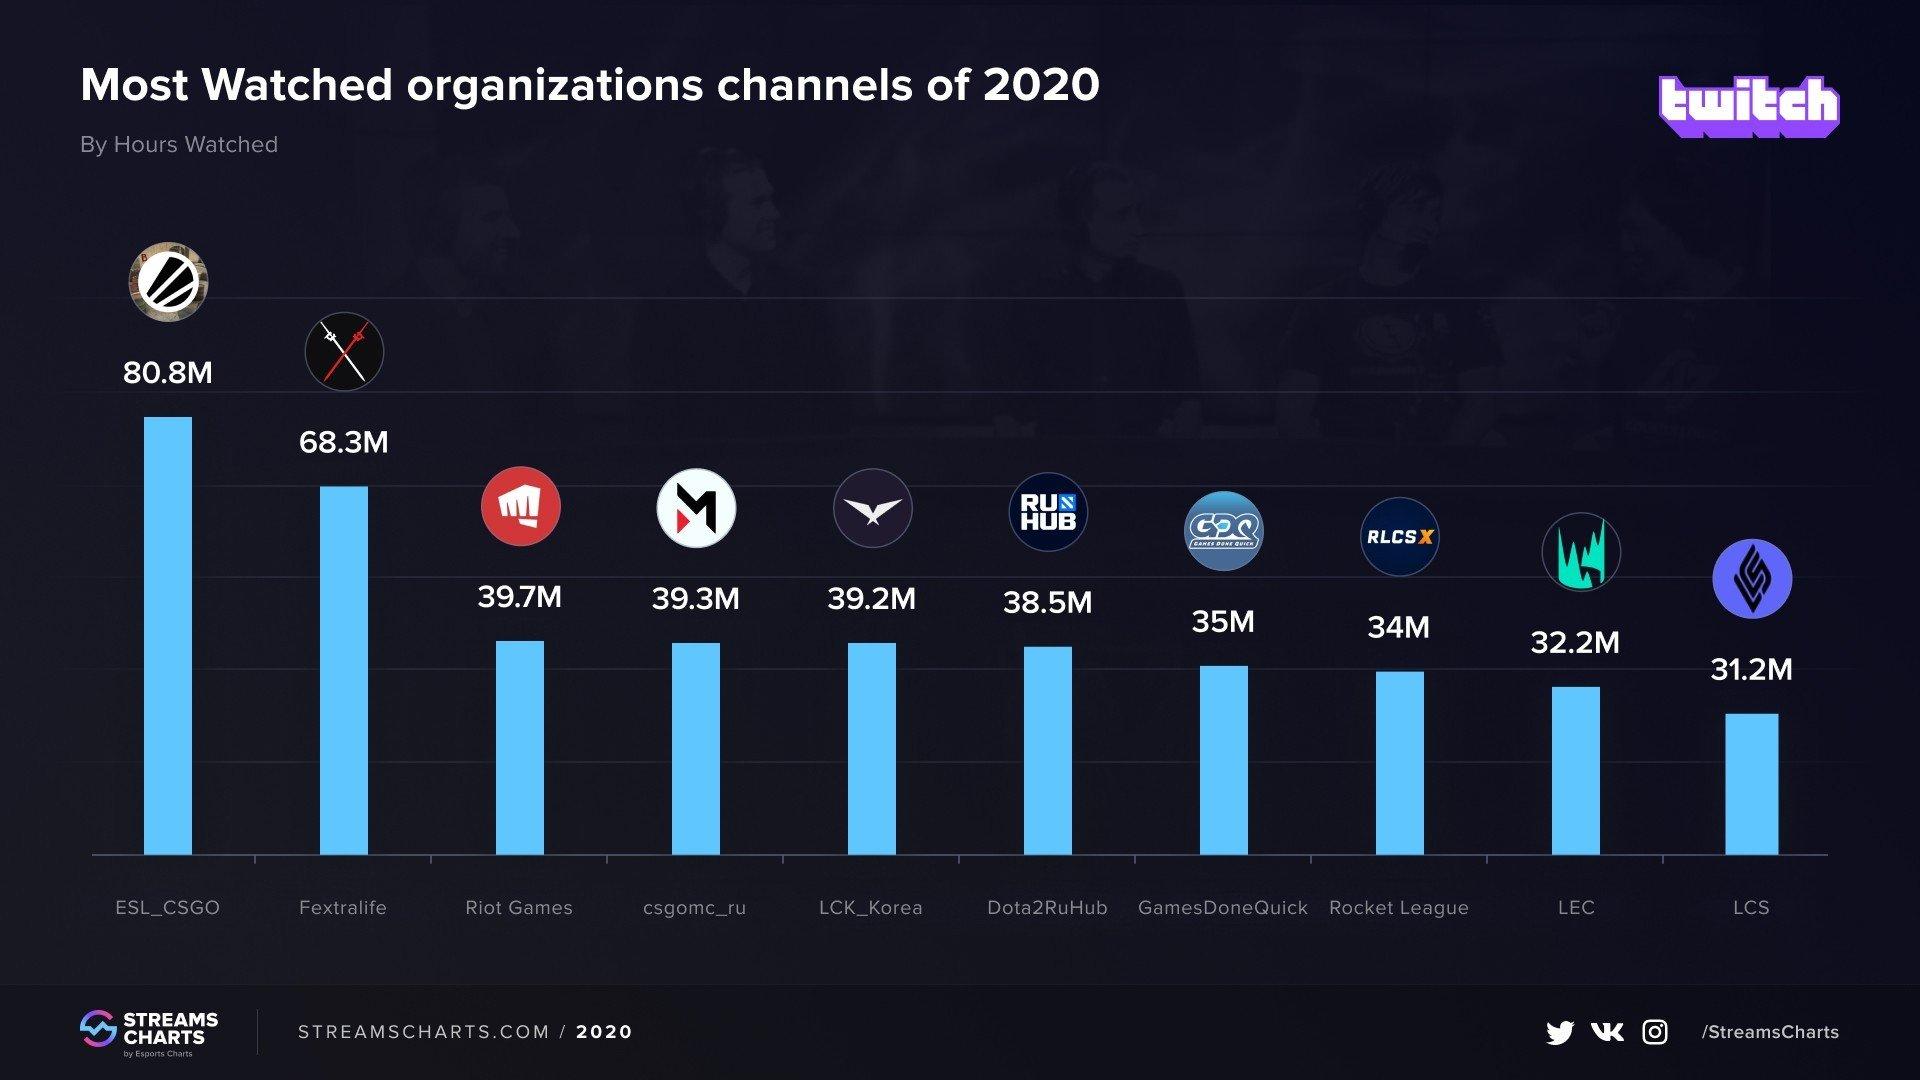 CSGOканал Maincast на Twitch занял 4 место по популярности